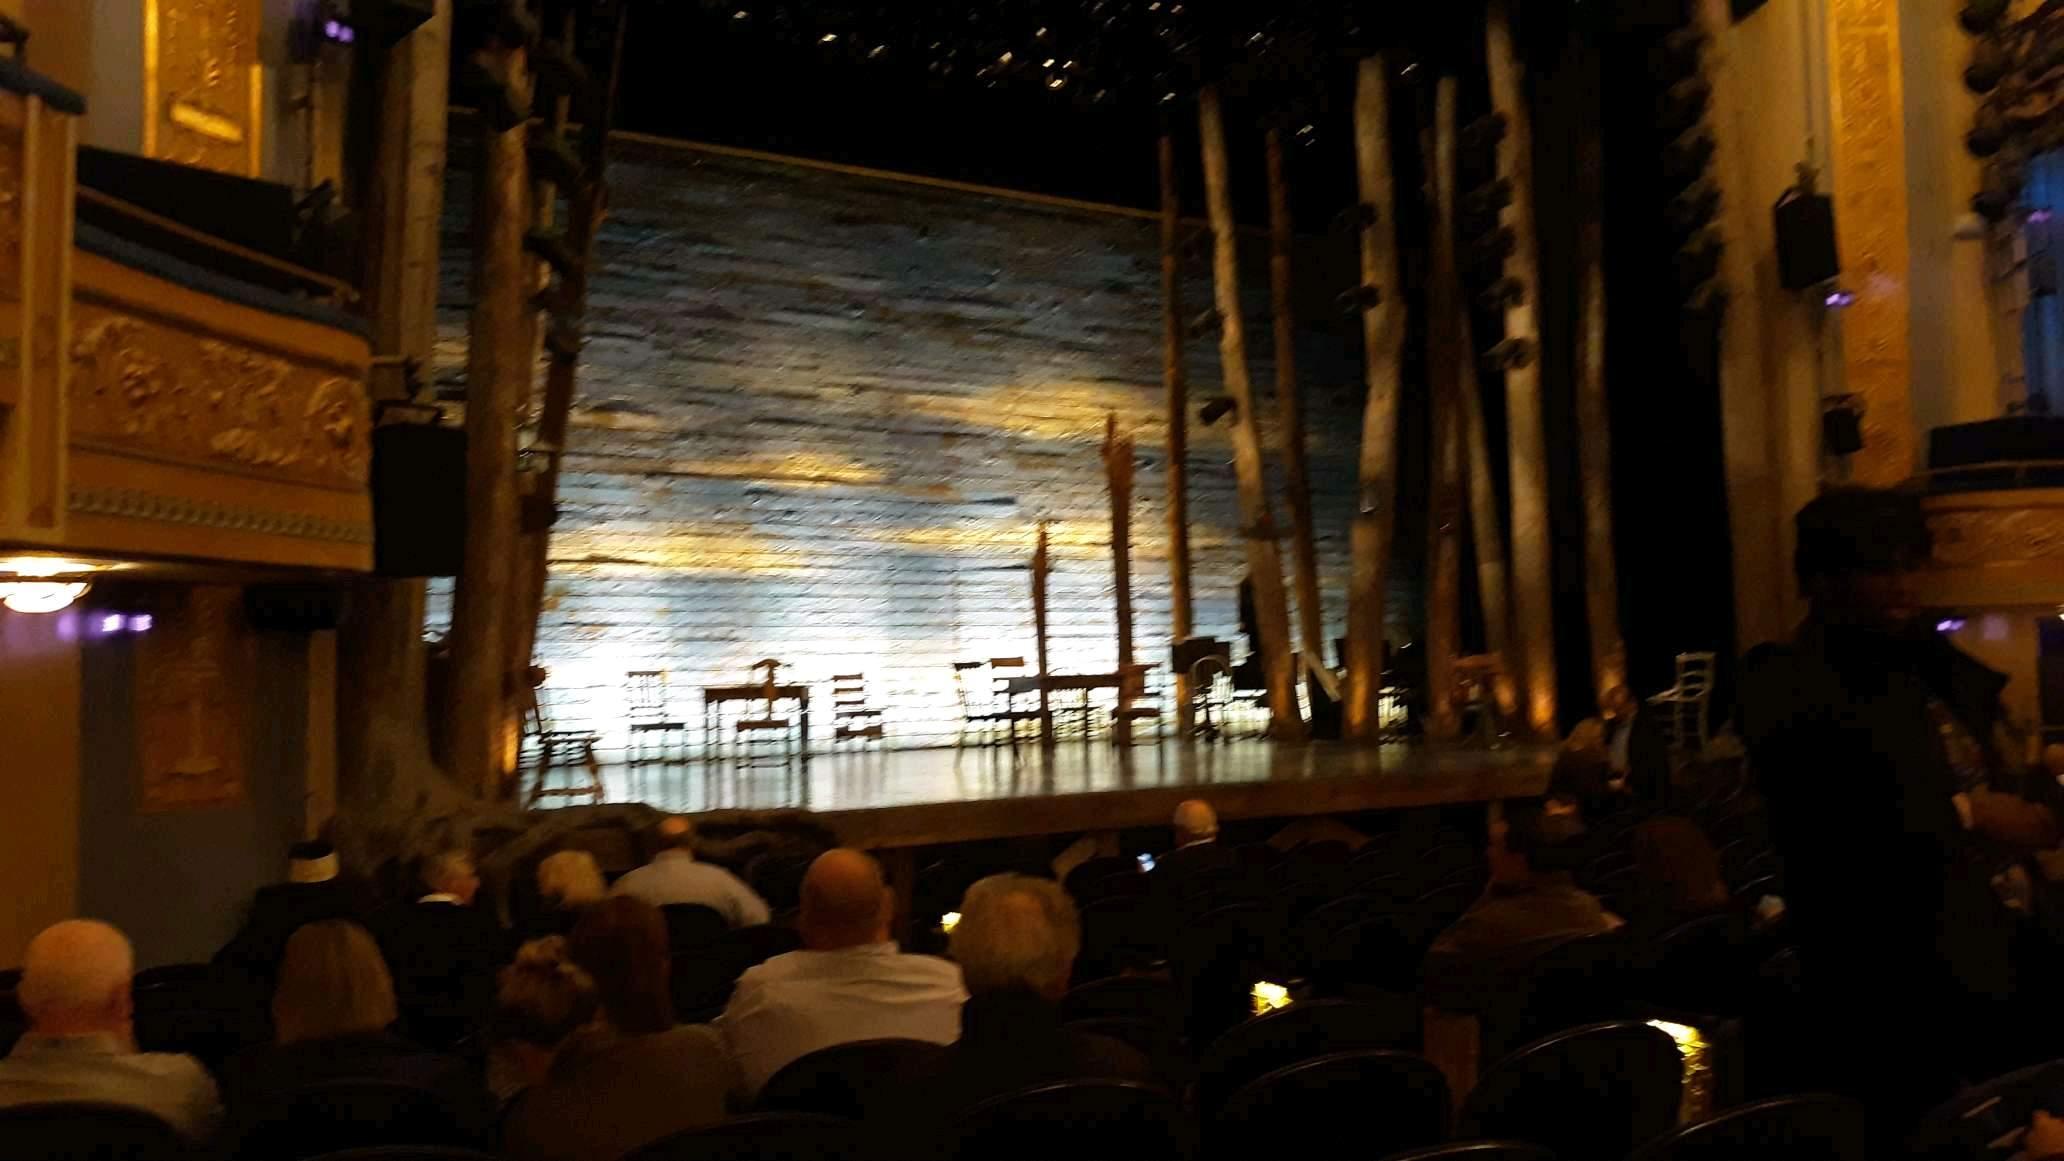 Gerald Schoenfeld Theatre Section Orchestra L Row L Seat 13